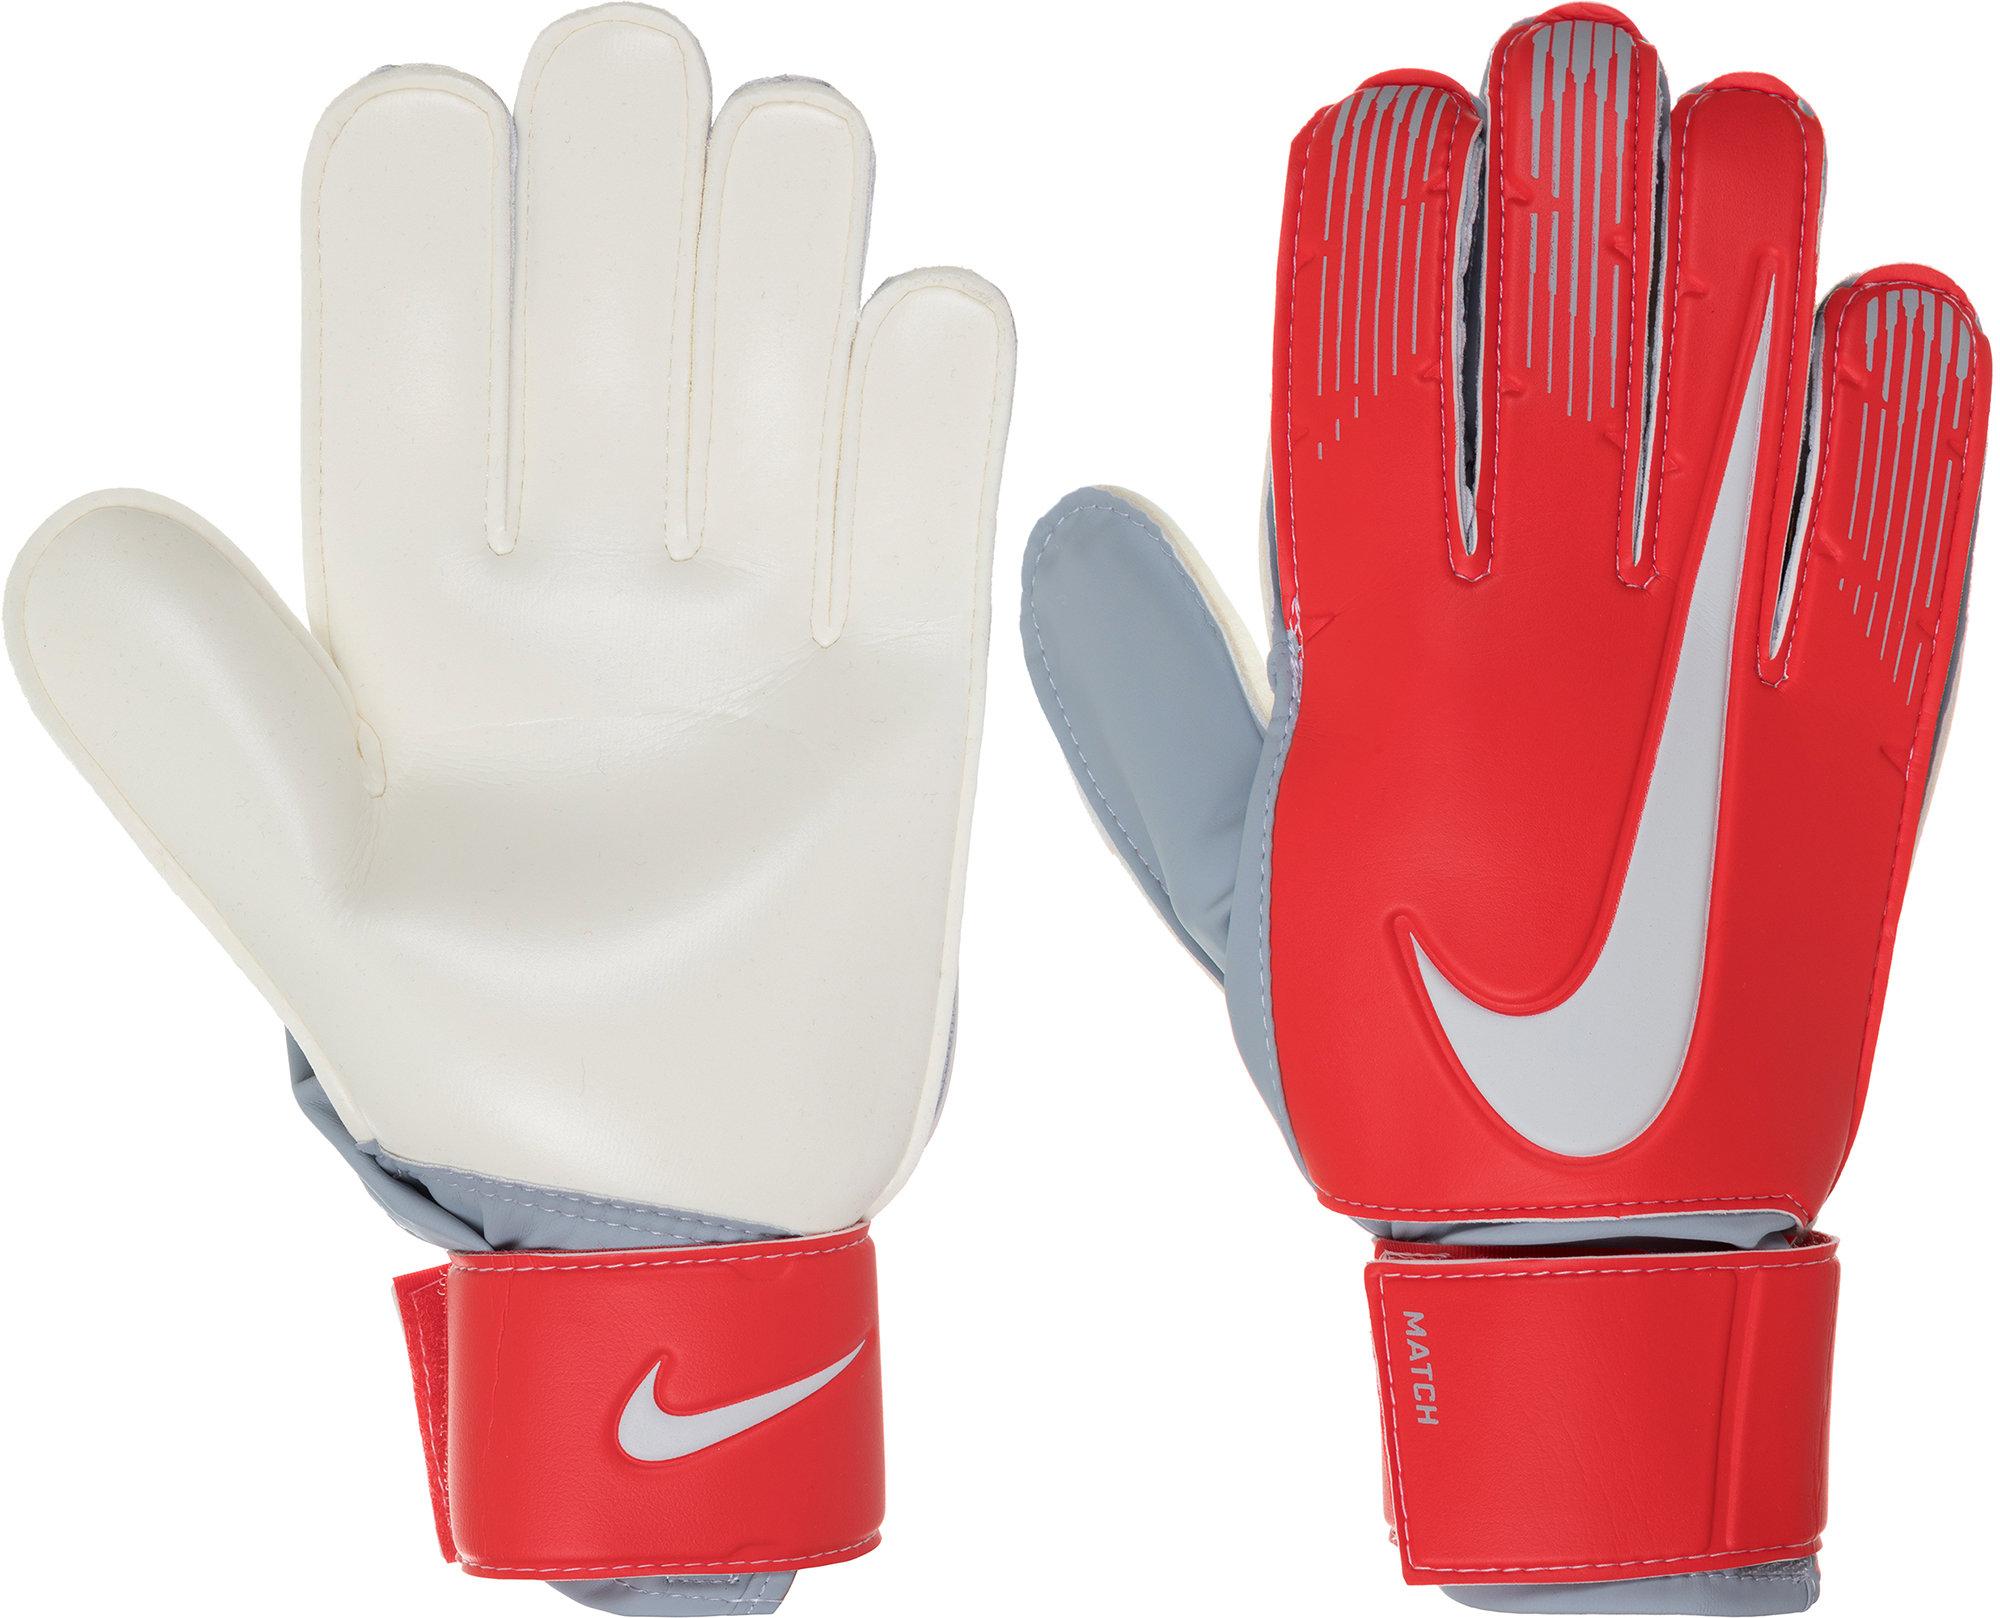 Перчатки вратарские Nike Match Goalkeeper, размер 11